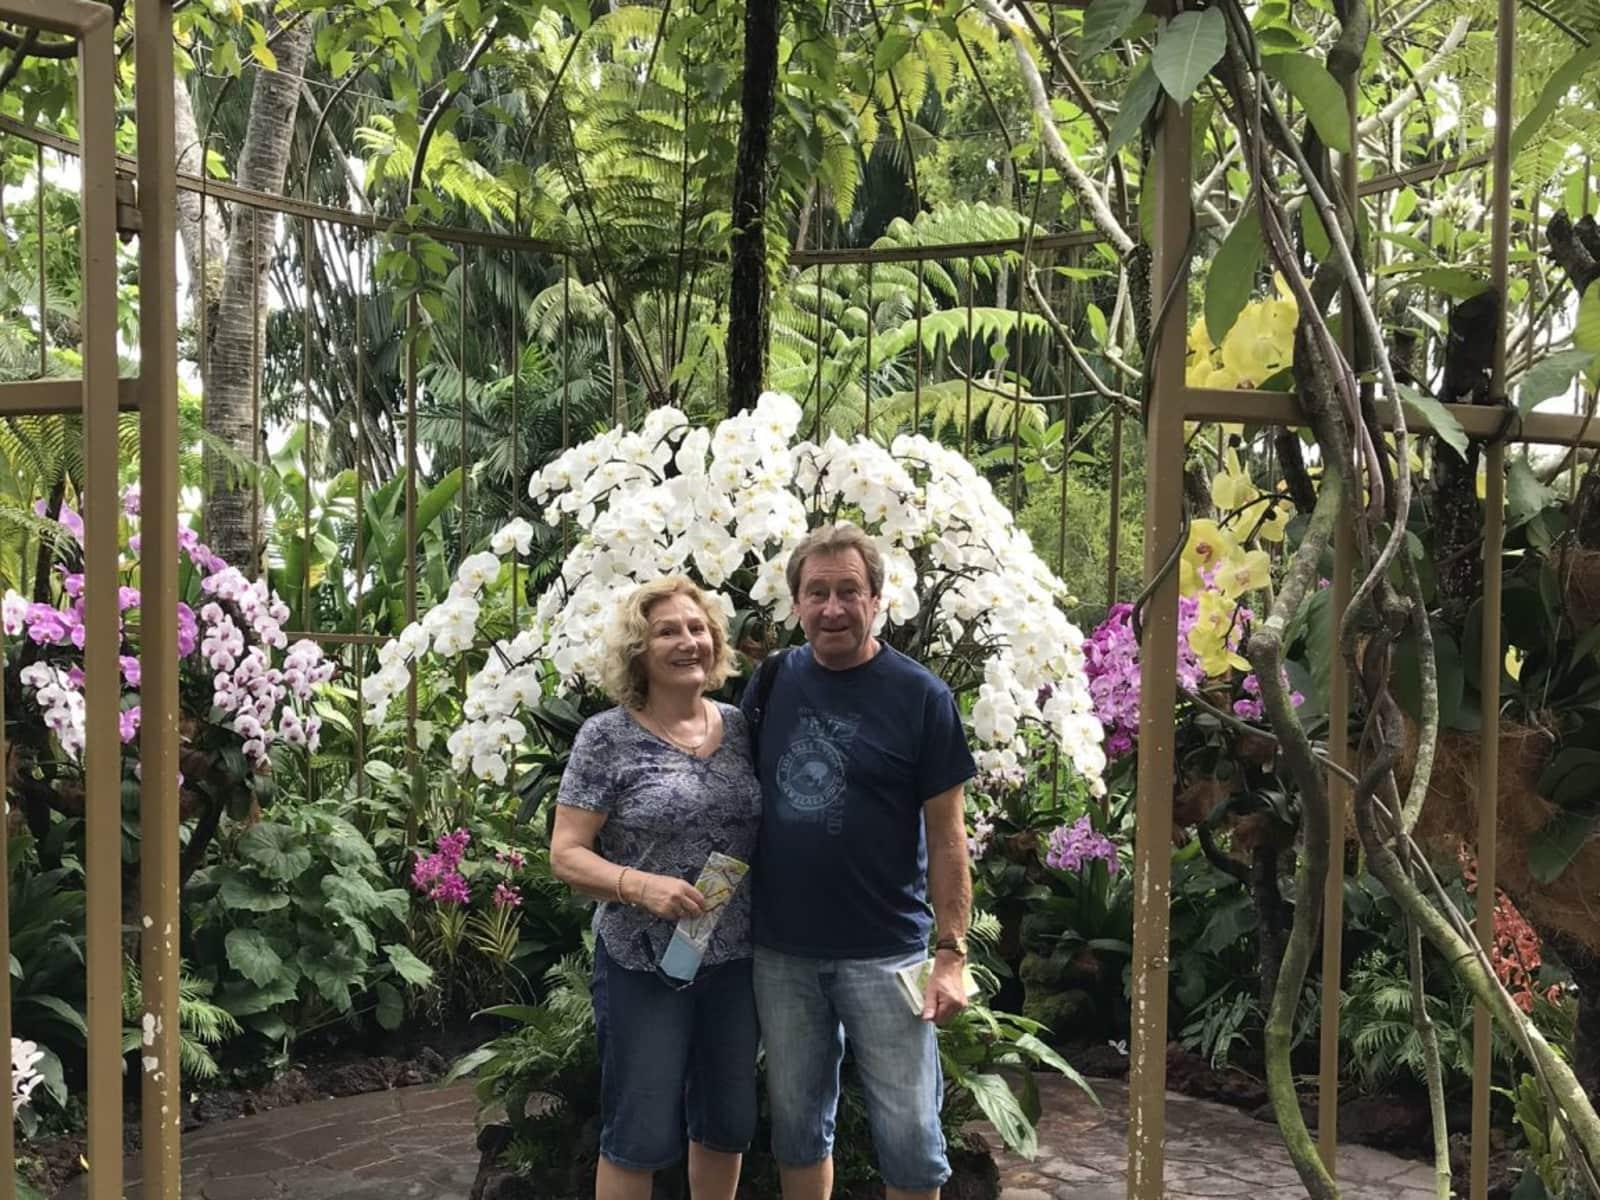 William & Ruth from York, United Kingdom